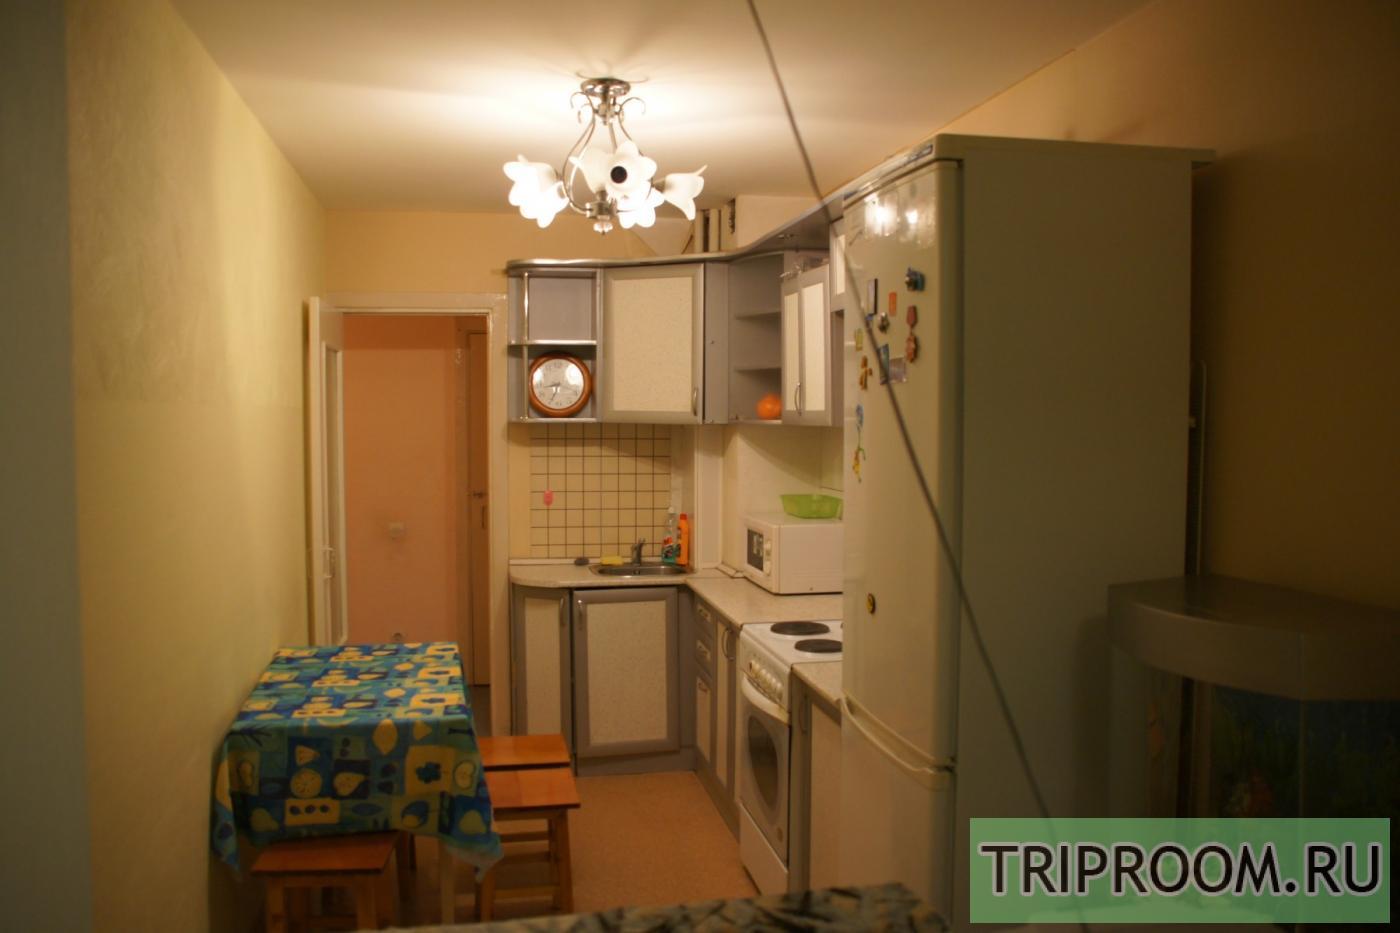 1-комнатная квартира посуточно (вариант № 30339), ул. Пархоменко улица, фото № 6